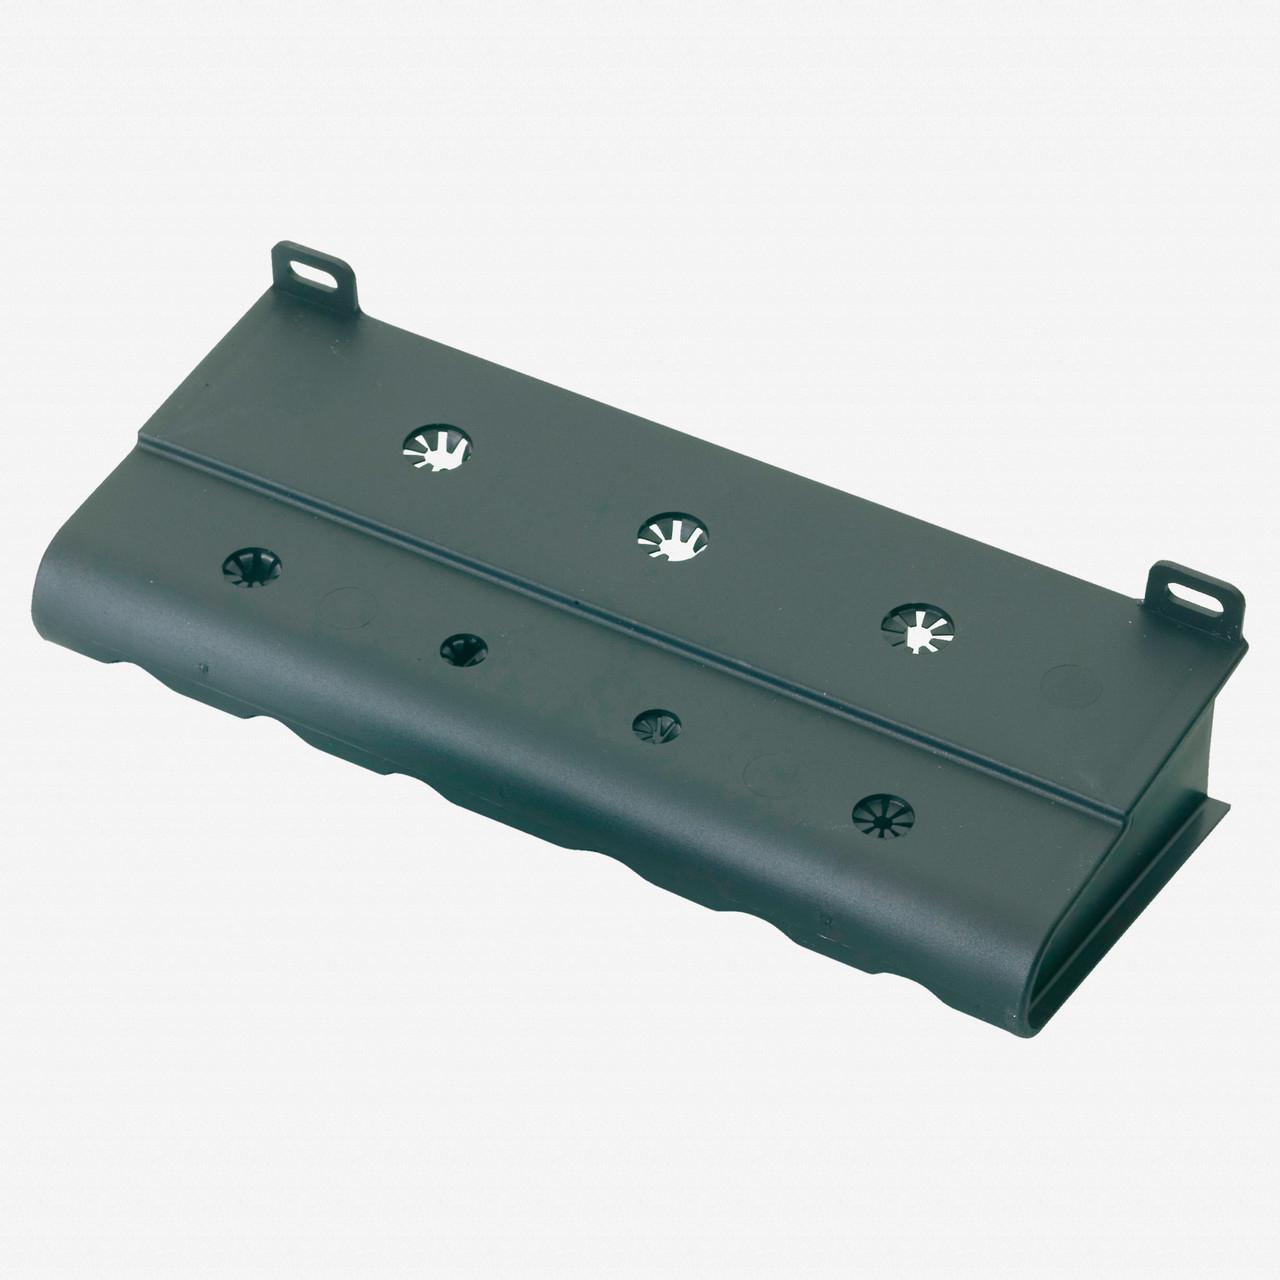 Wera 134001 Rack for Kraftform Screwdrivers - KC Tool